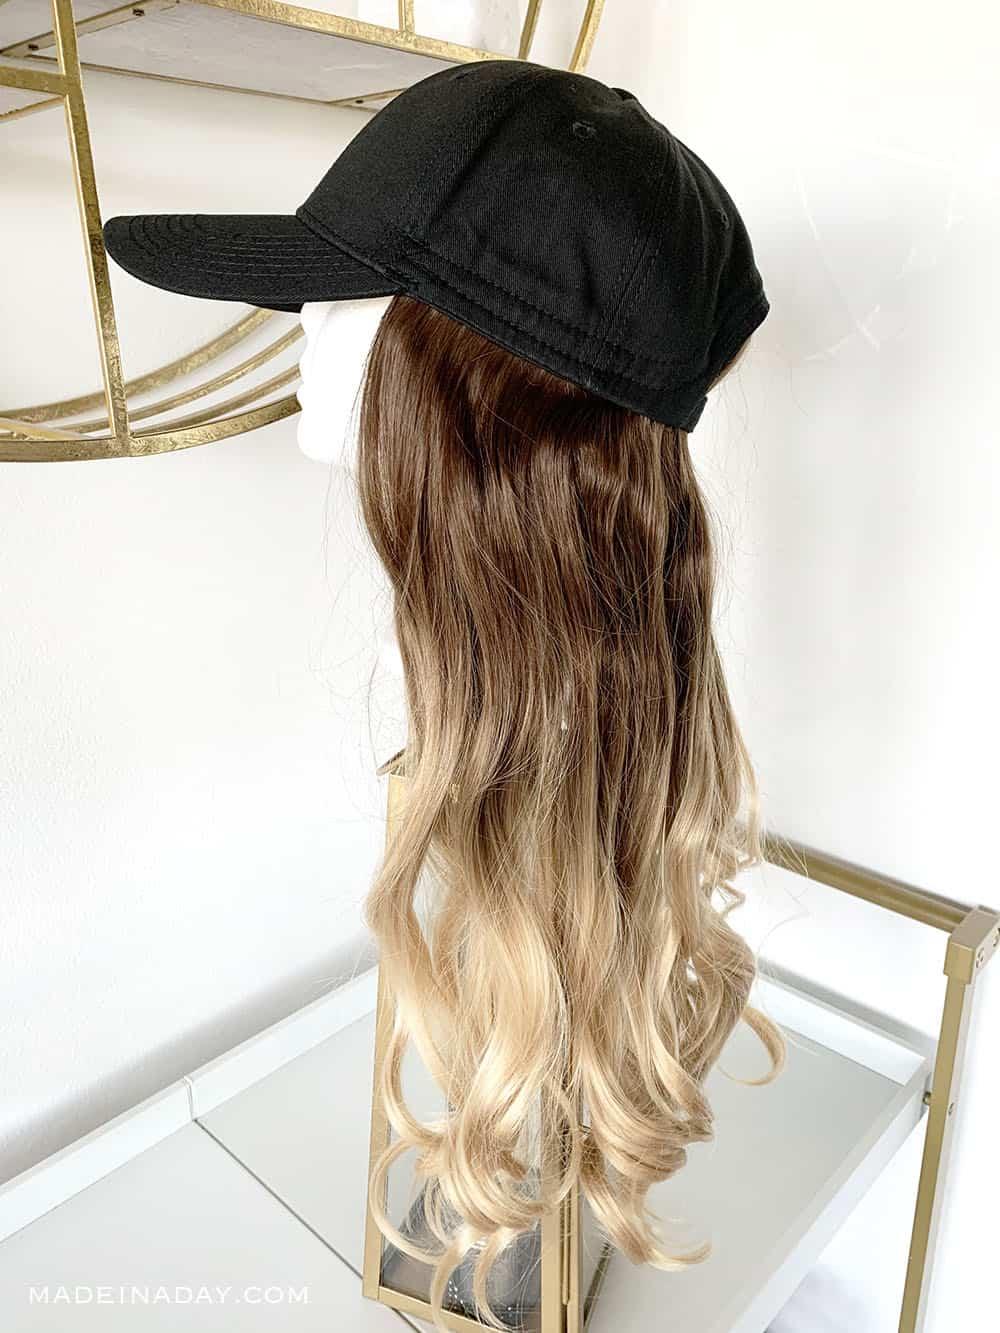 Baseball hat wig